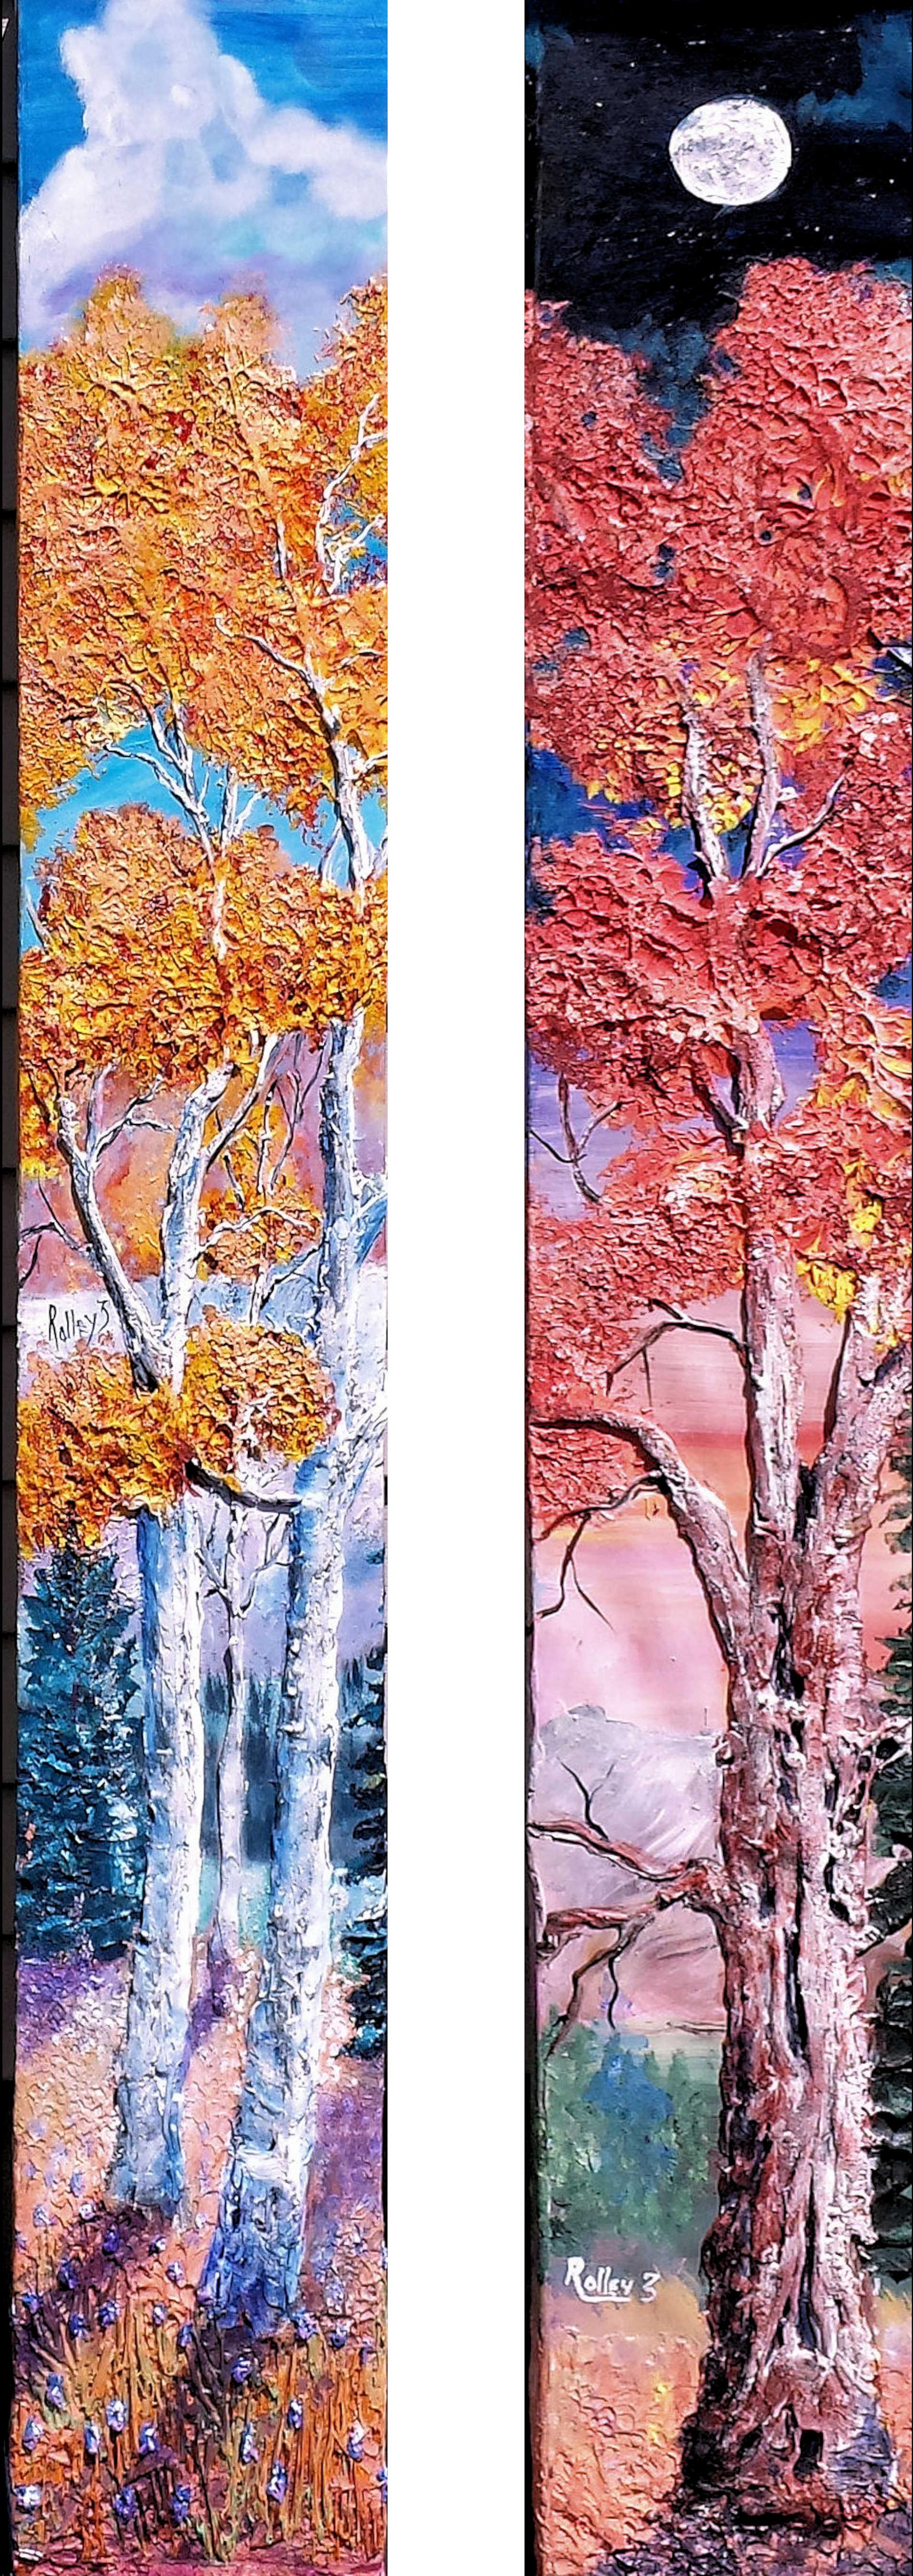 diptic        (2 paintings)  long-fall-painting 9x60in $600